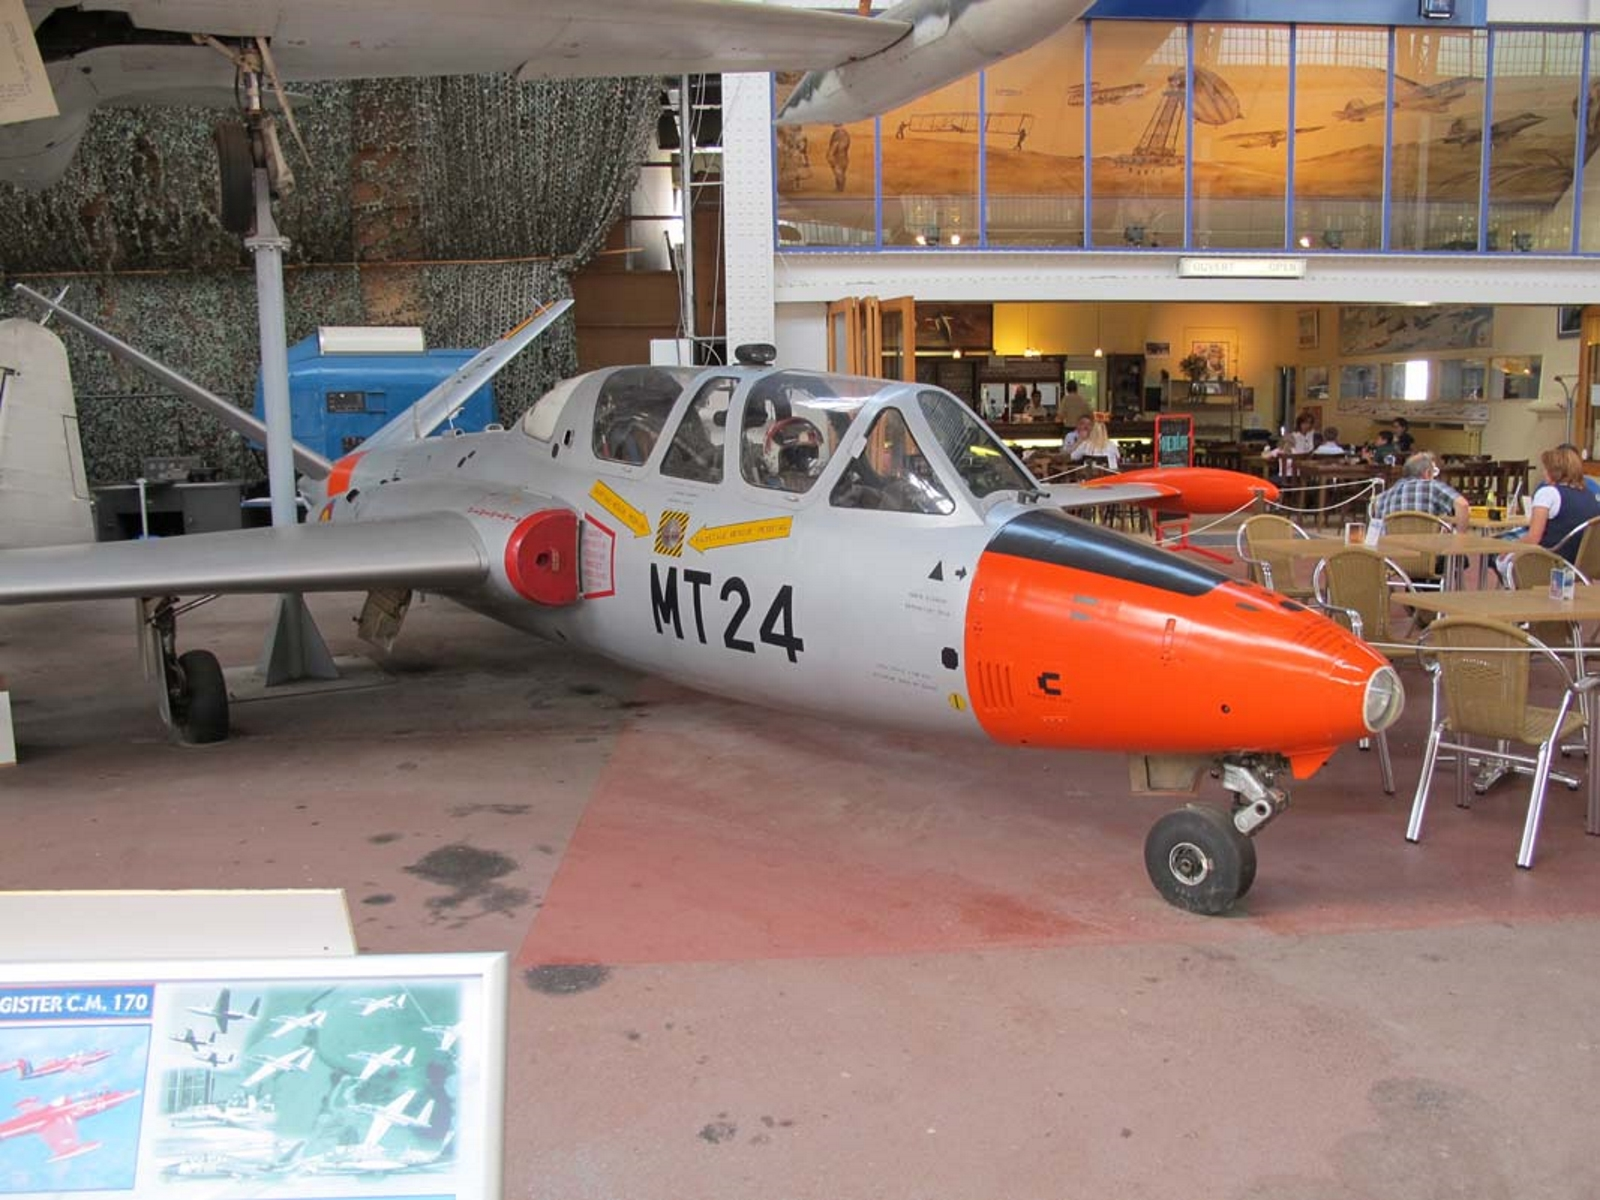 Fouga Magister C. M. 170